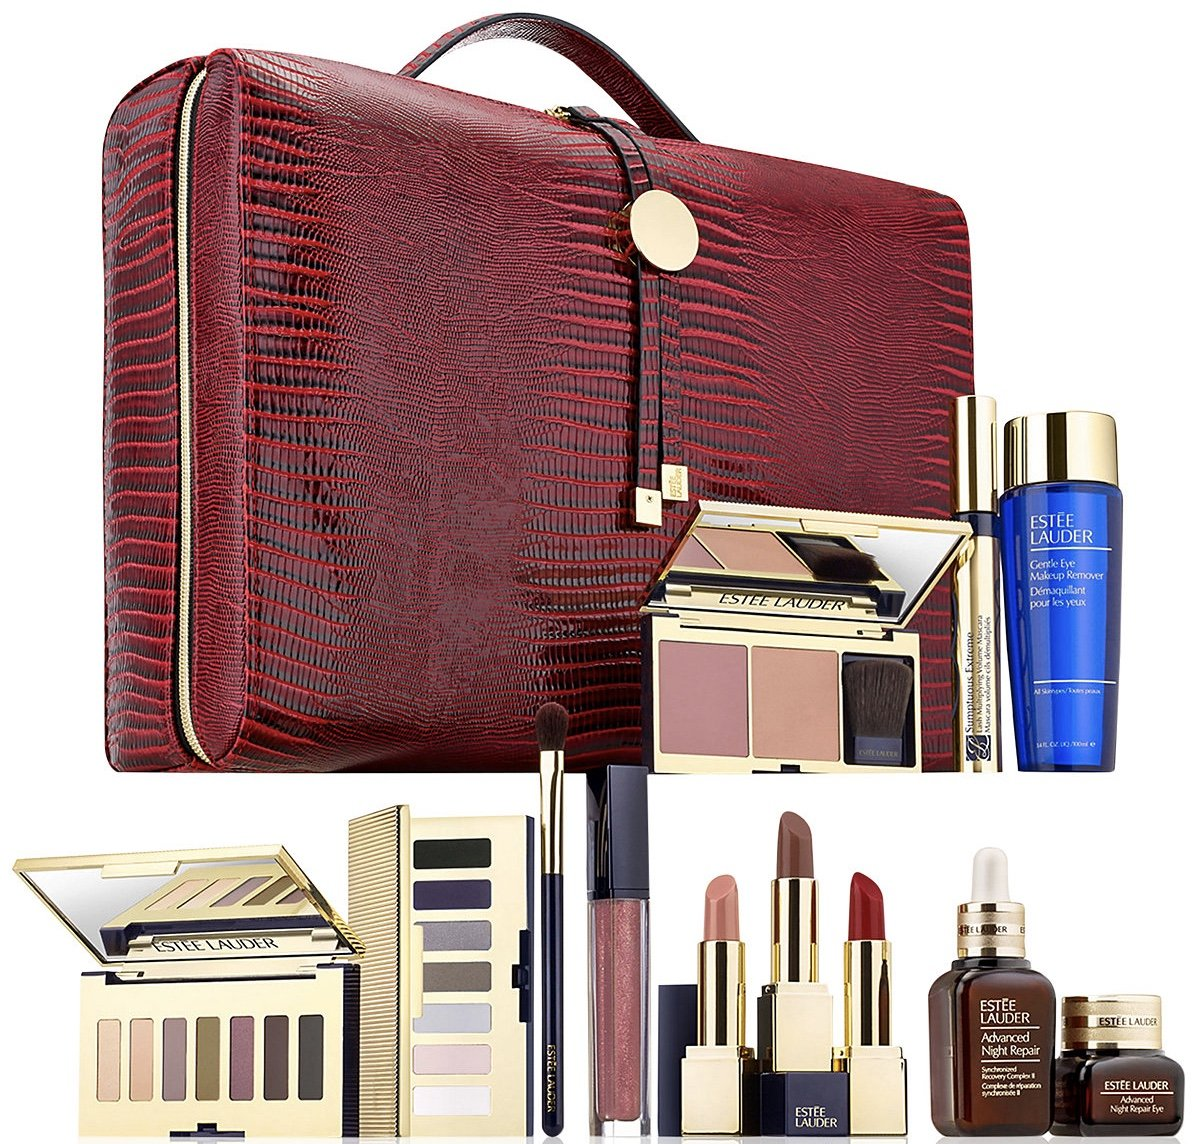 Estee Lauder Modern Classics 12 Full-Size Favorites Gift Set